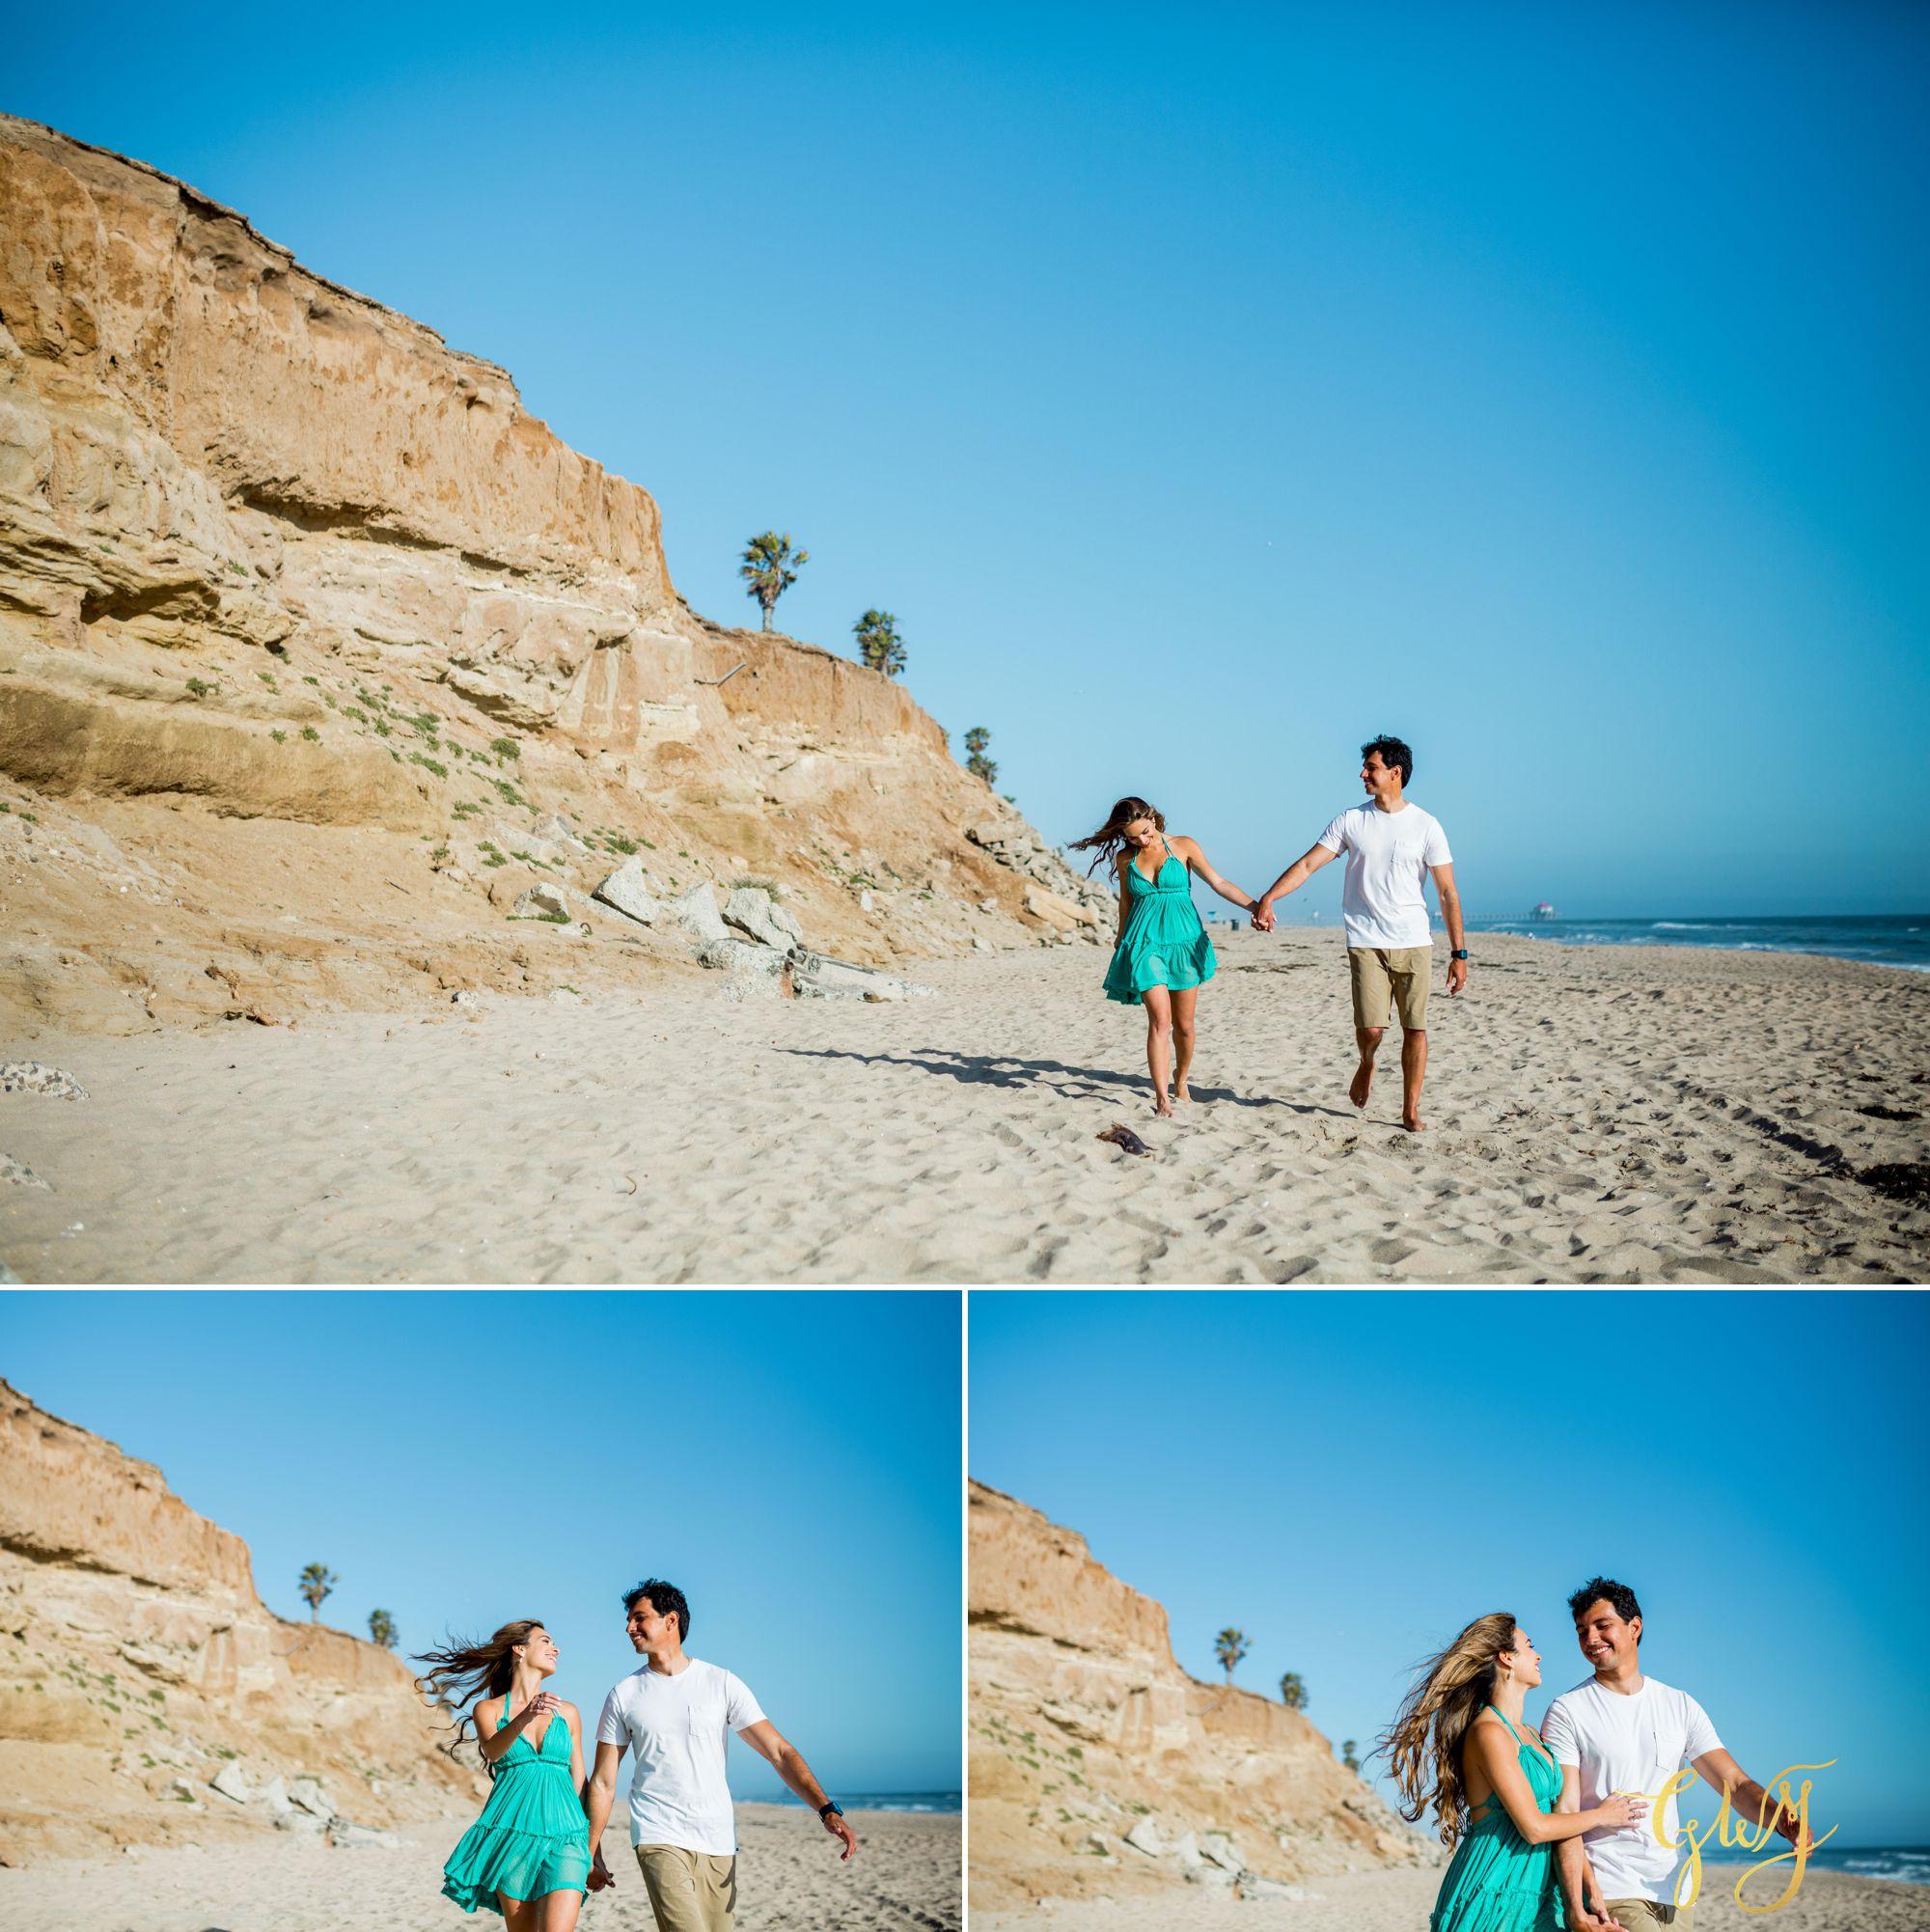 Felipe + Isabella Huntington Beach Summer Sunset Engagement Session by Glass Woods Media 1.jpg